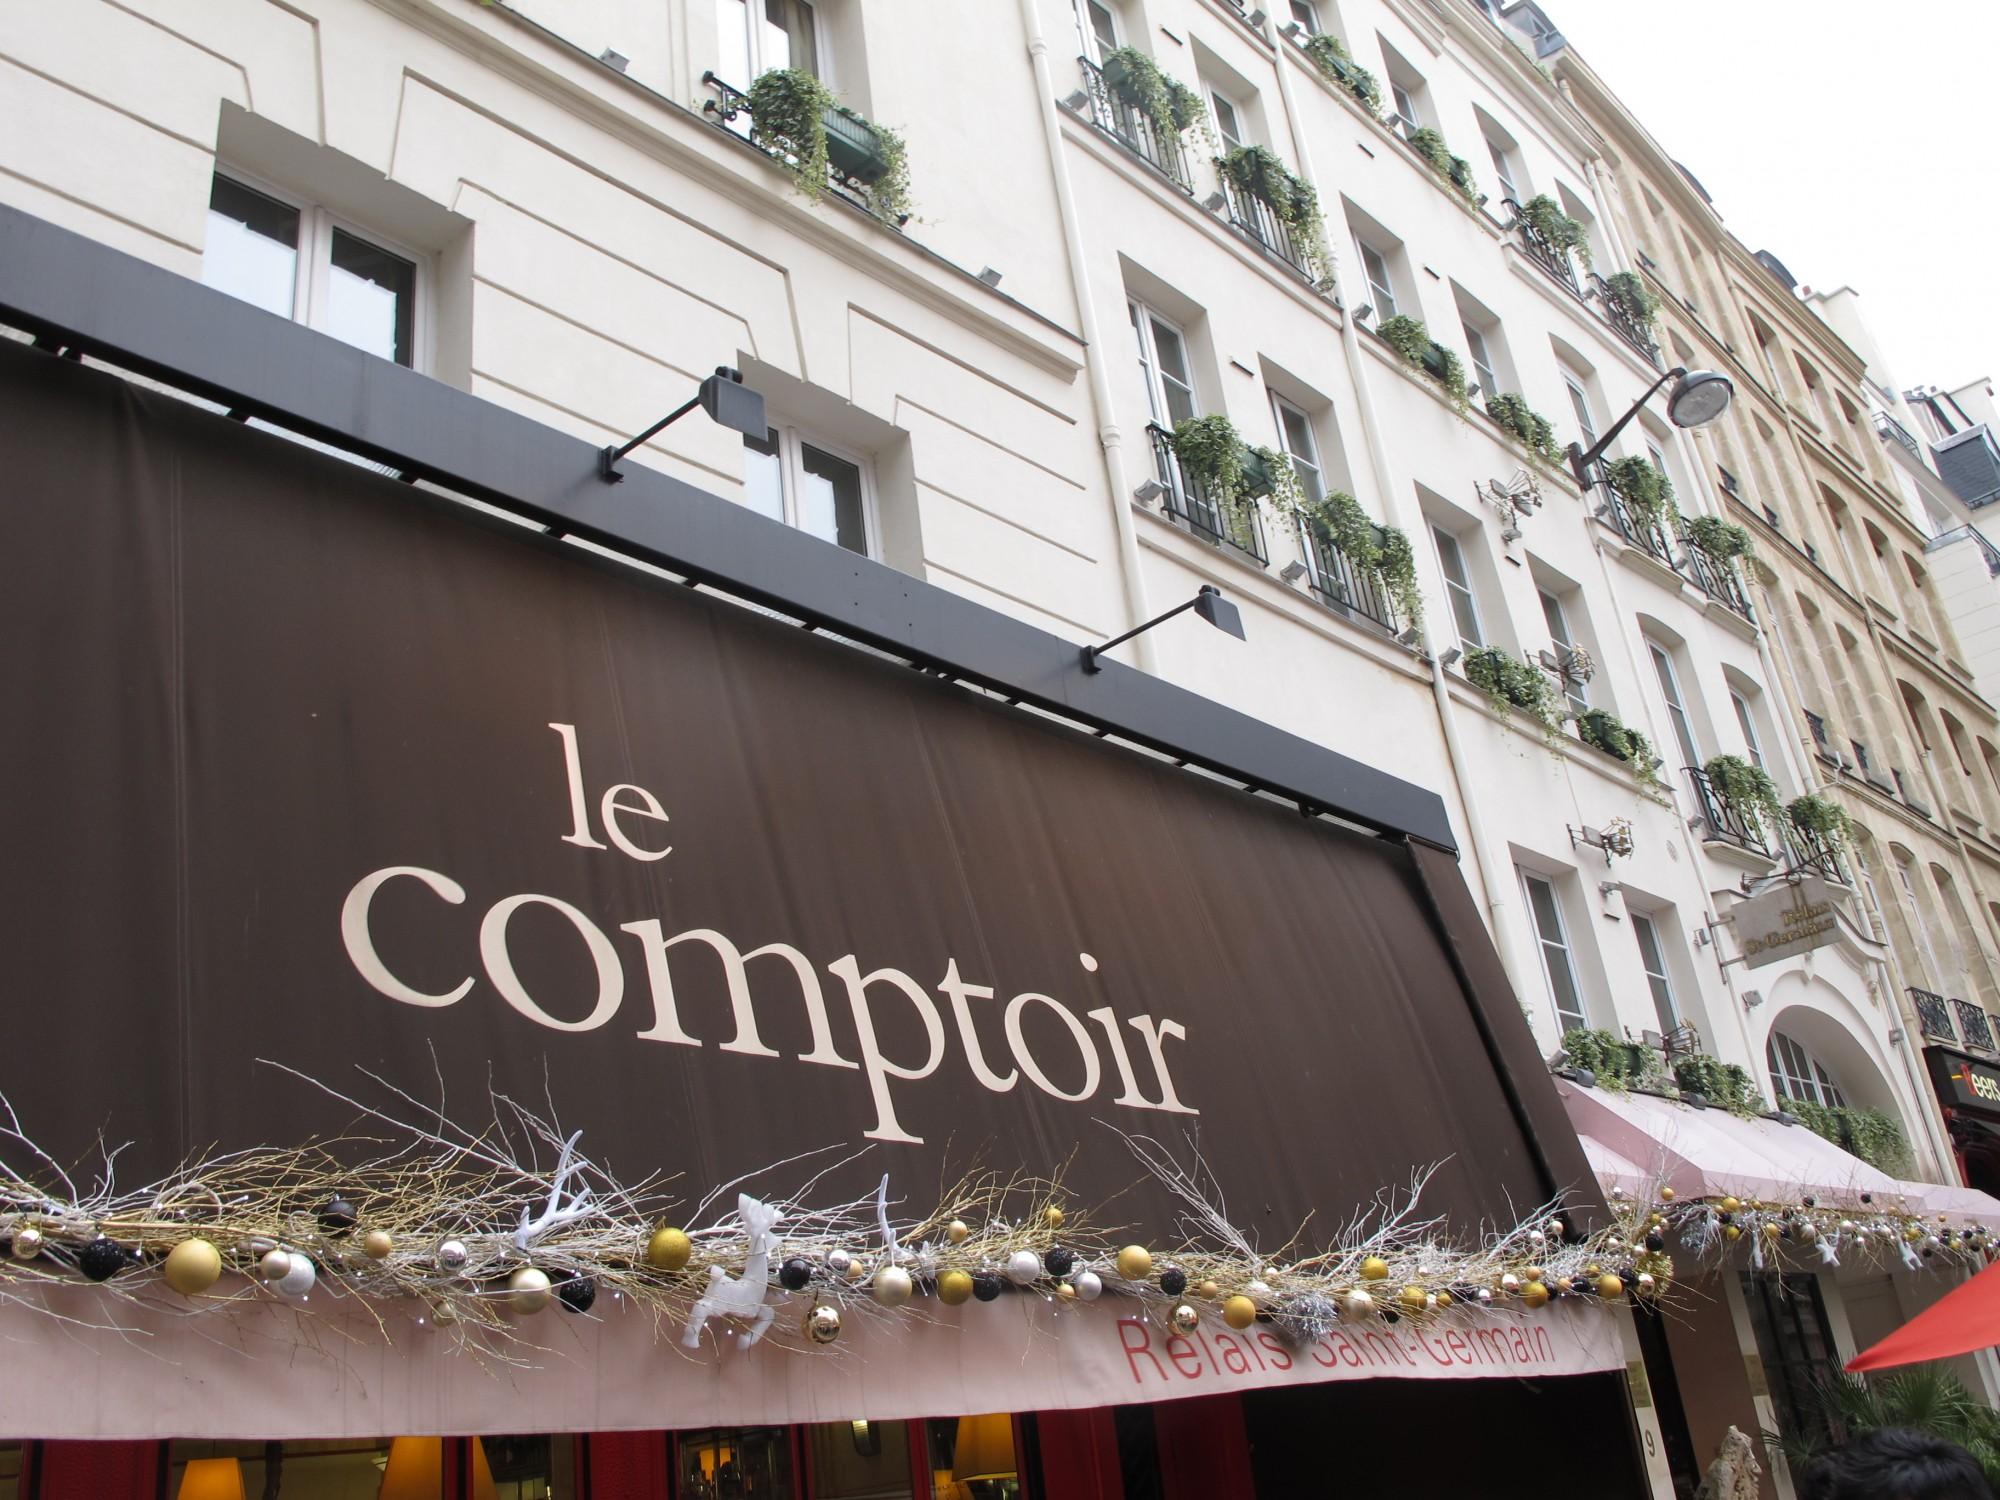 le comptoir du relais yves camdeborde the parisienne. Black Bedroom Furniture Sets. Home Design Ideas